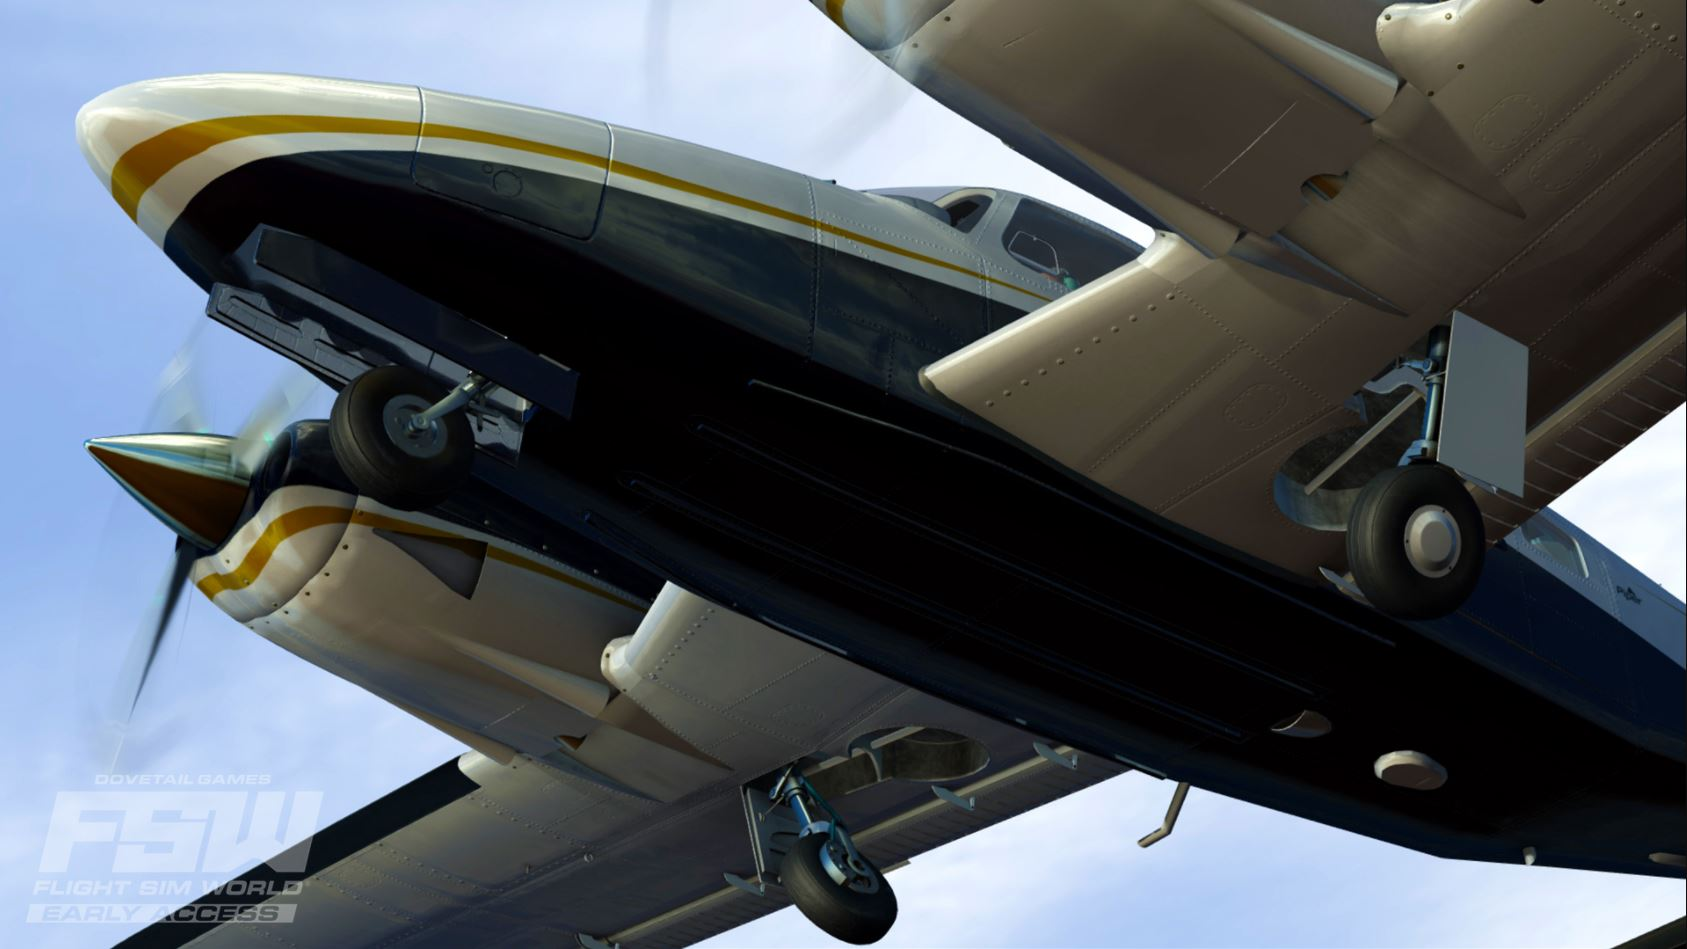 flight-sim-world-en-acces-anticipe-sur-steam-screen145